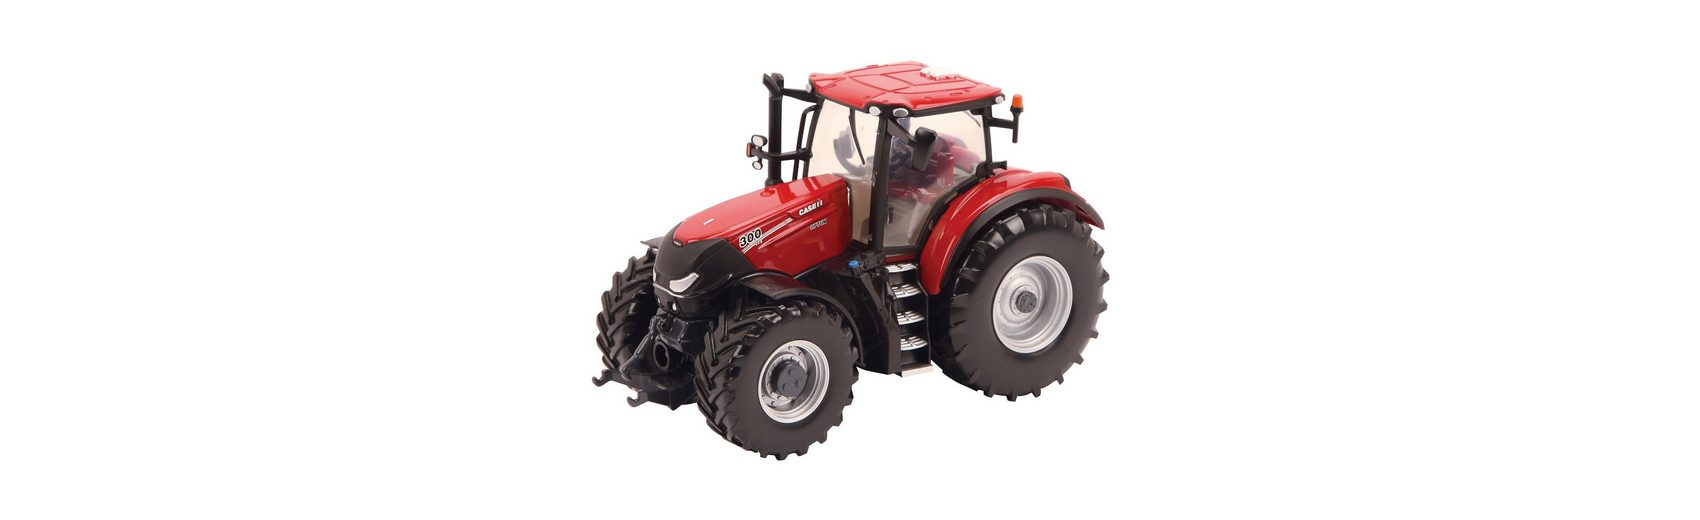 TOMY Britains - CASE - IH 300 CVX Traktor 1:32